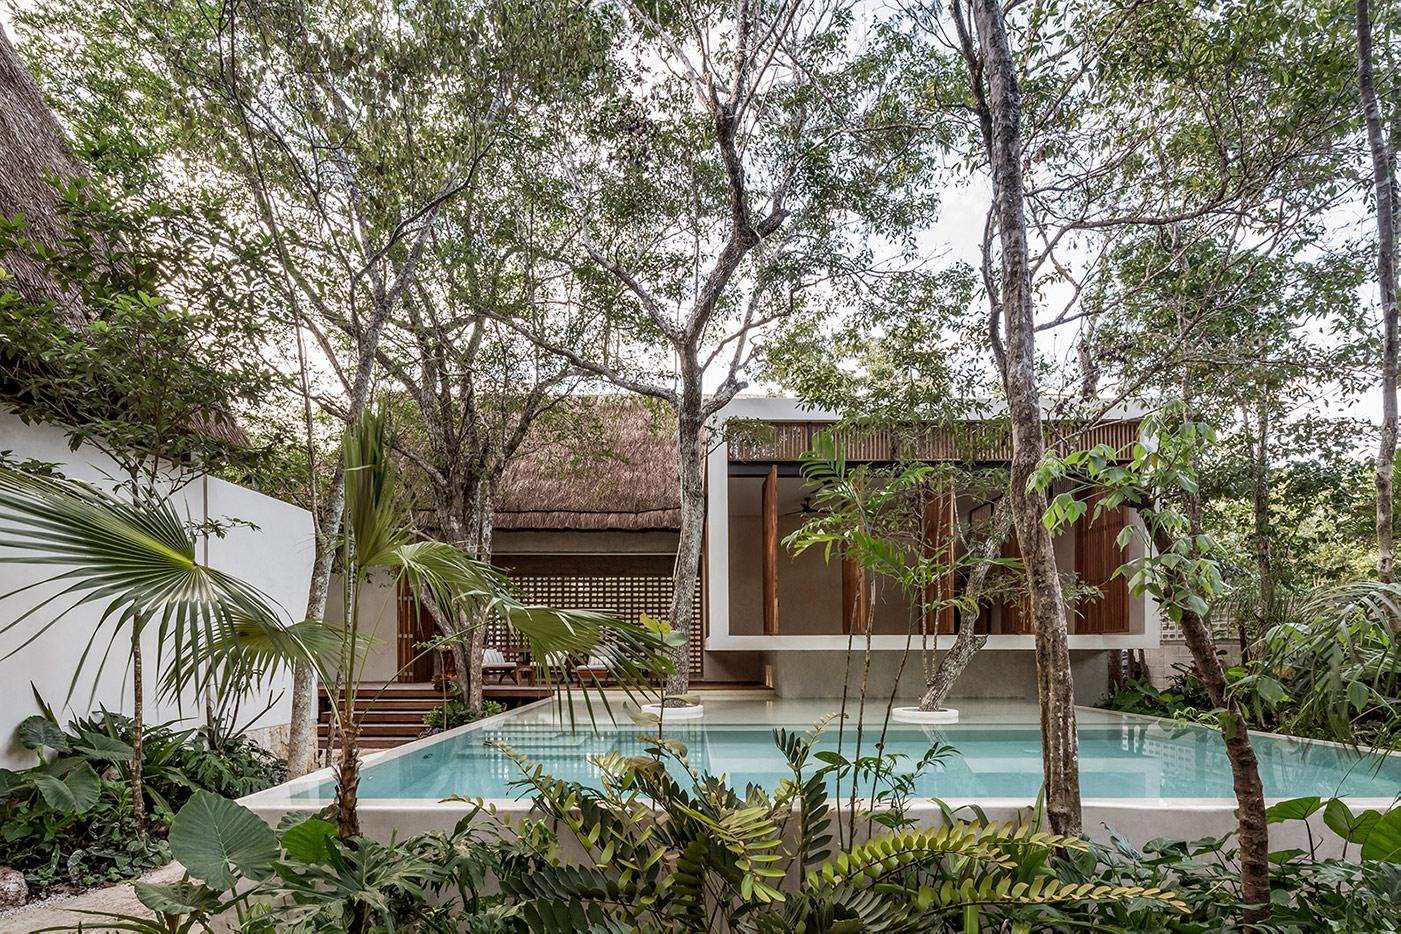 Jungle Keva Tulum - View of lodge with pool